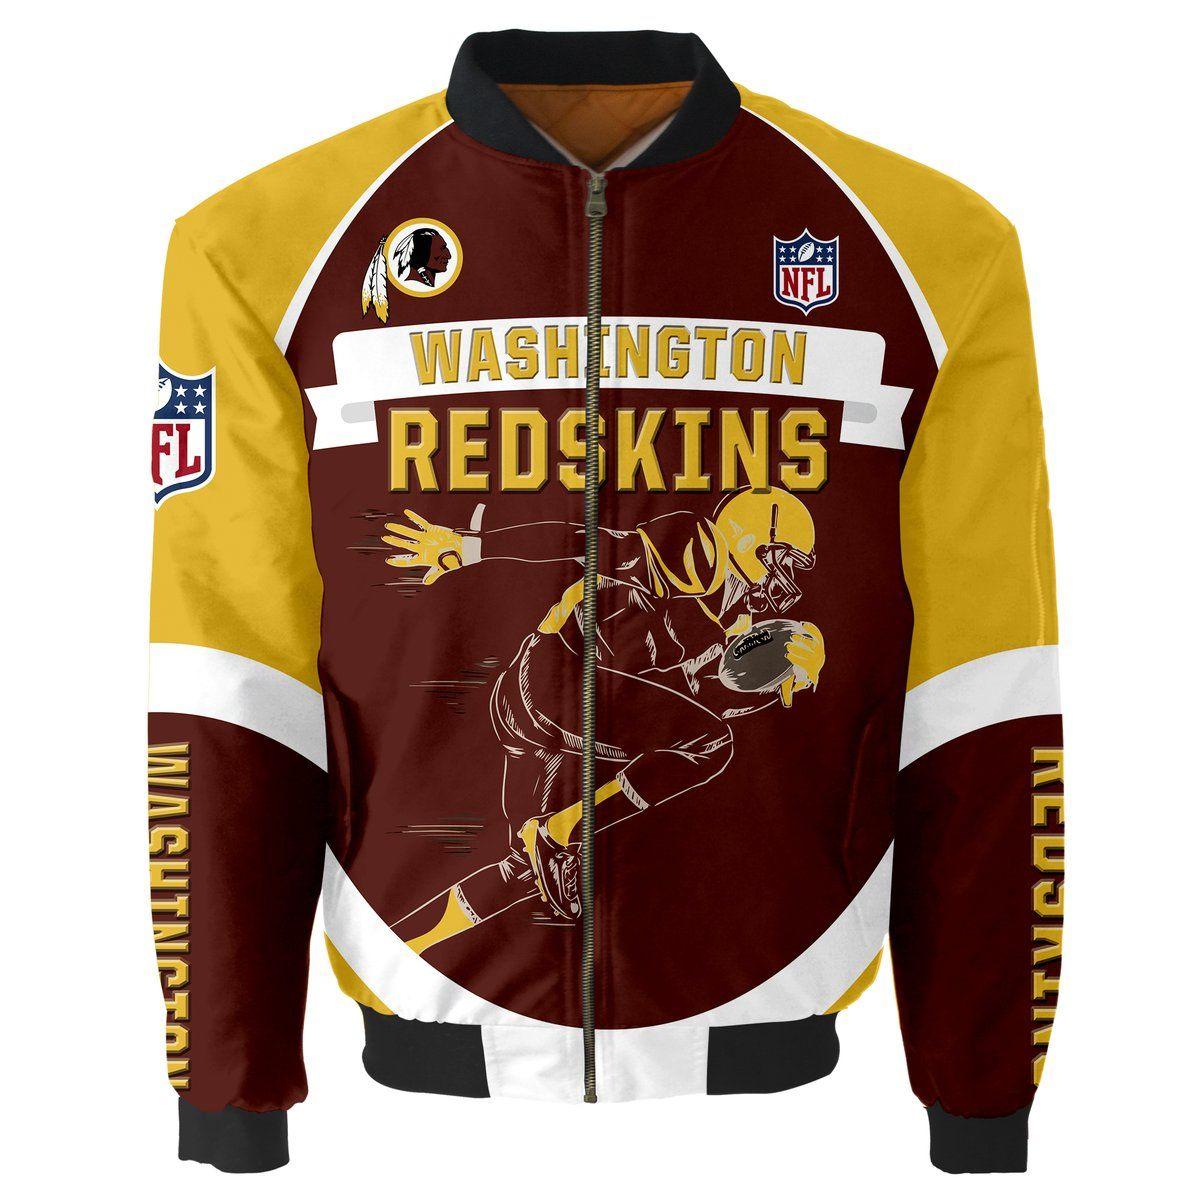 Pin on nfl hoodies jacket ho odies sweatshirts outfit